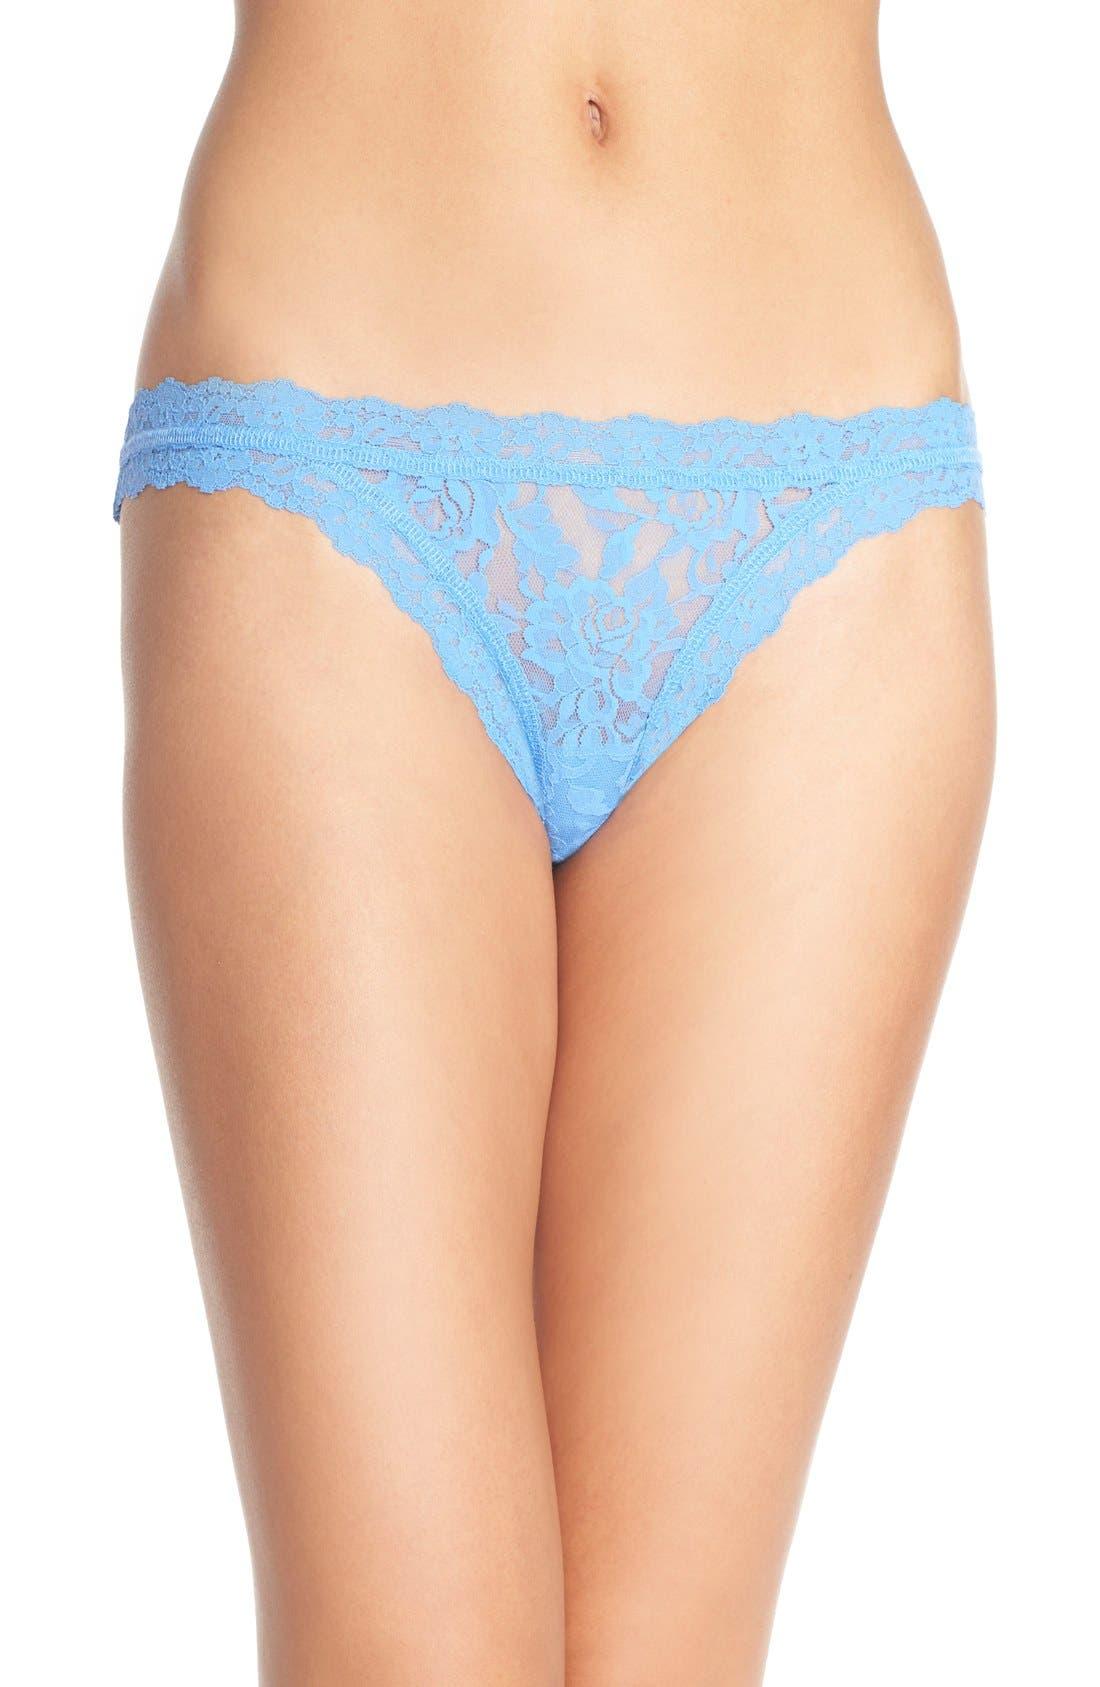 'Signature Lace' Brazilian Bikini,                             Main thumbnail 12, color,